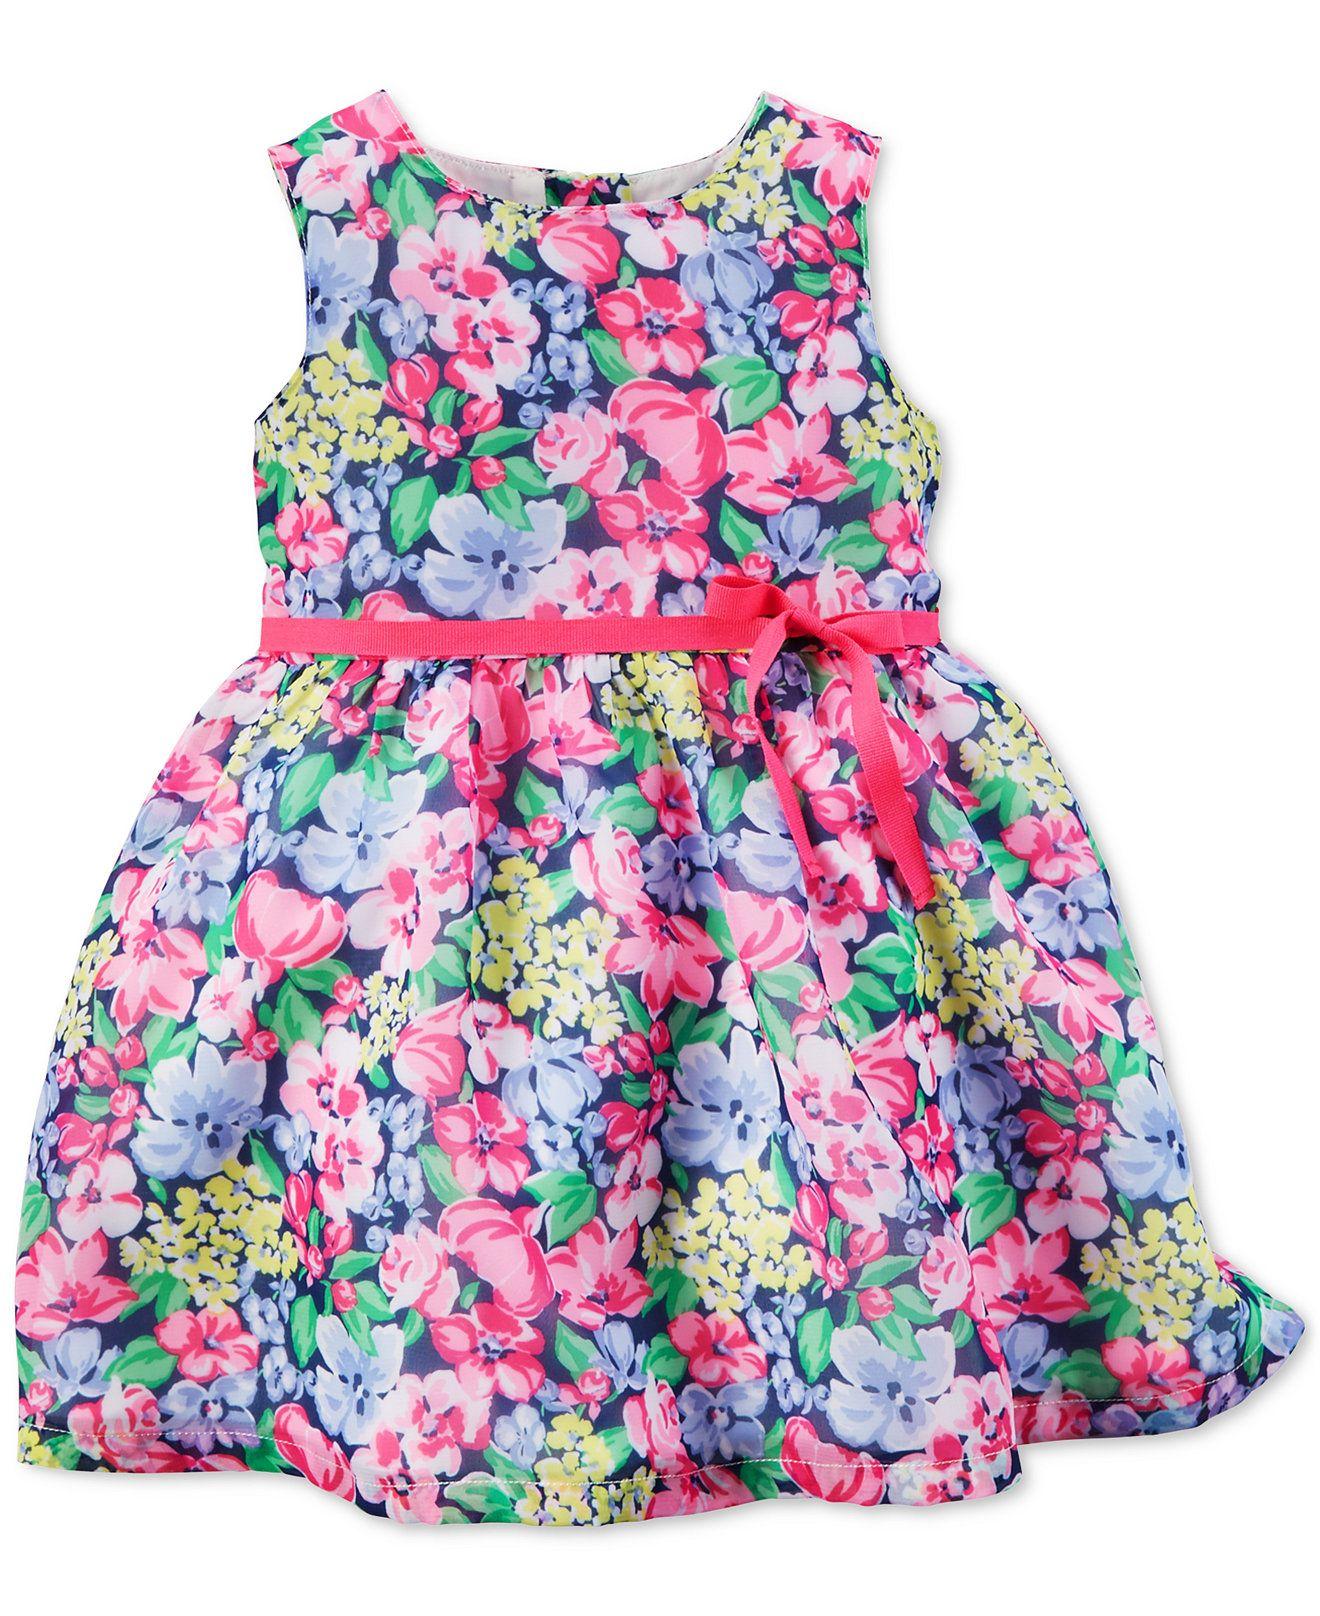 Carter s Baby Girls Floral Print Dress Kids & Baby Macy s